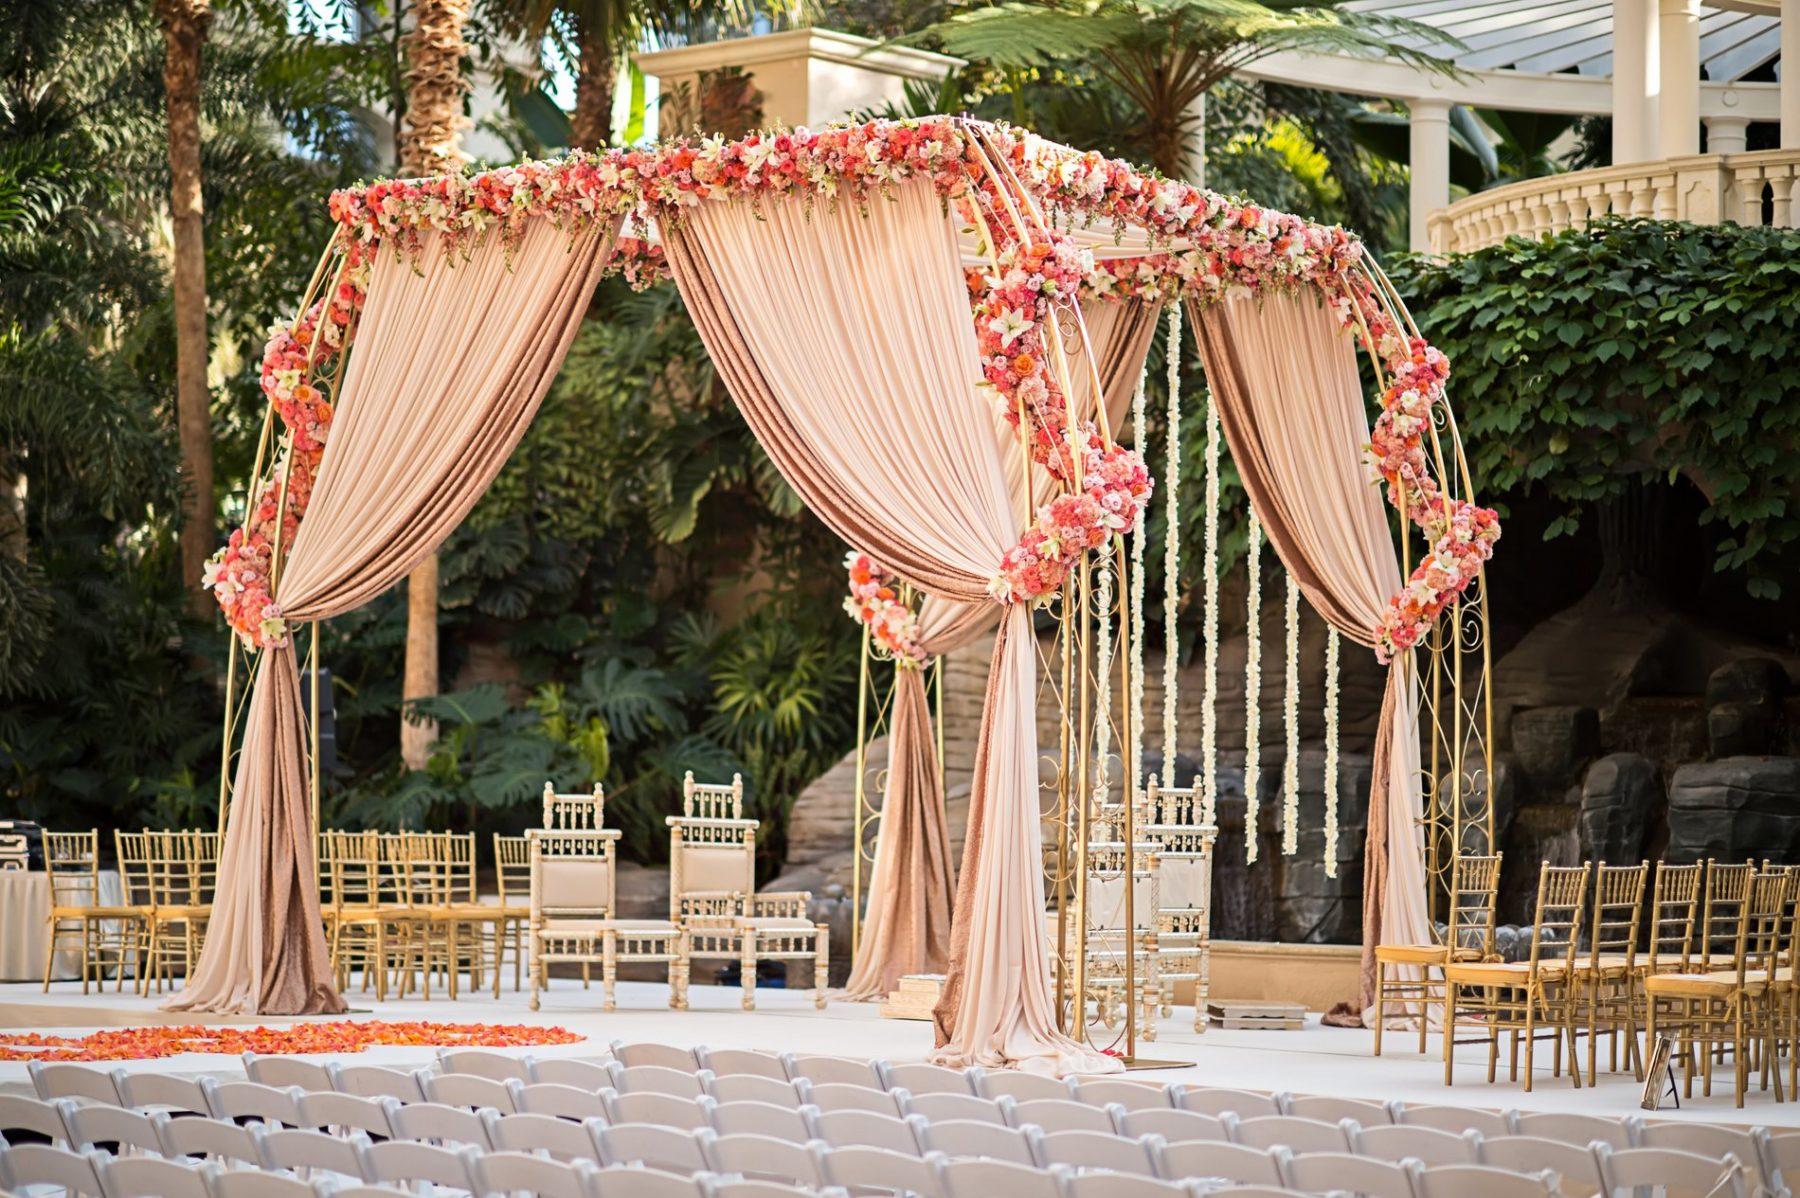 8 Tips to Photograph an Indian Wedding, Miami Wedding Photographers | Häring Photography, Indian Wedding Photographer in Florida, Best Muslim, Hindu - South East Asian Wedding Photographers